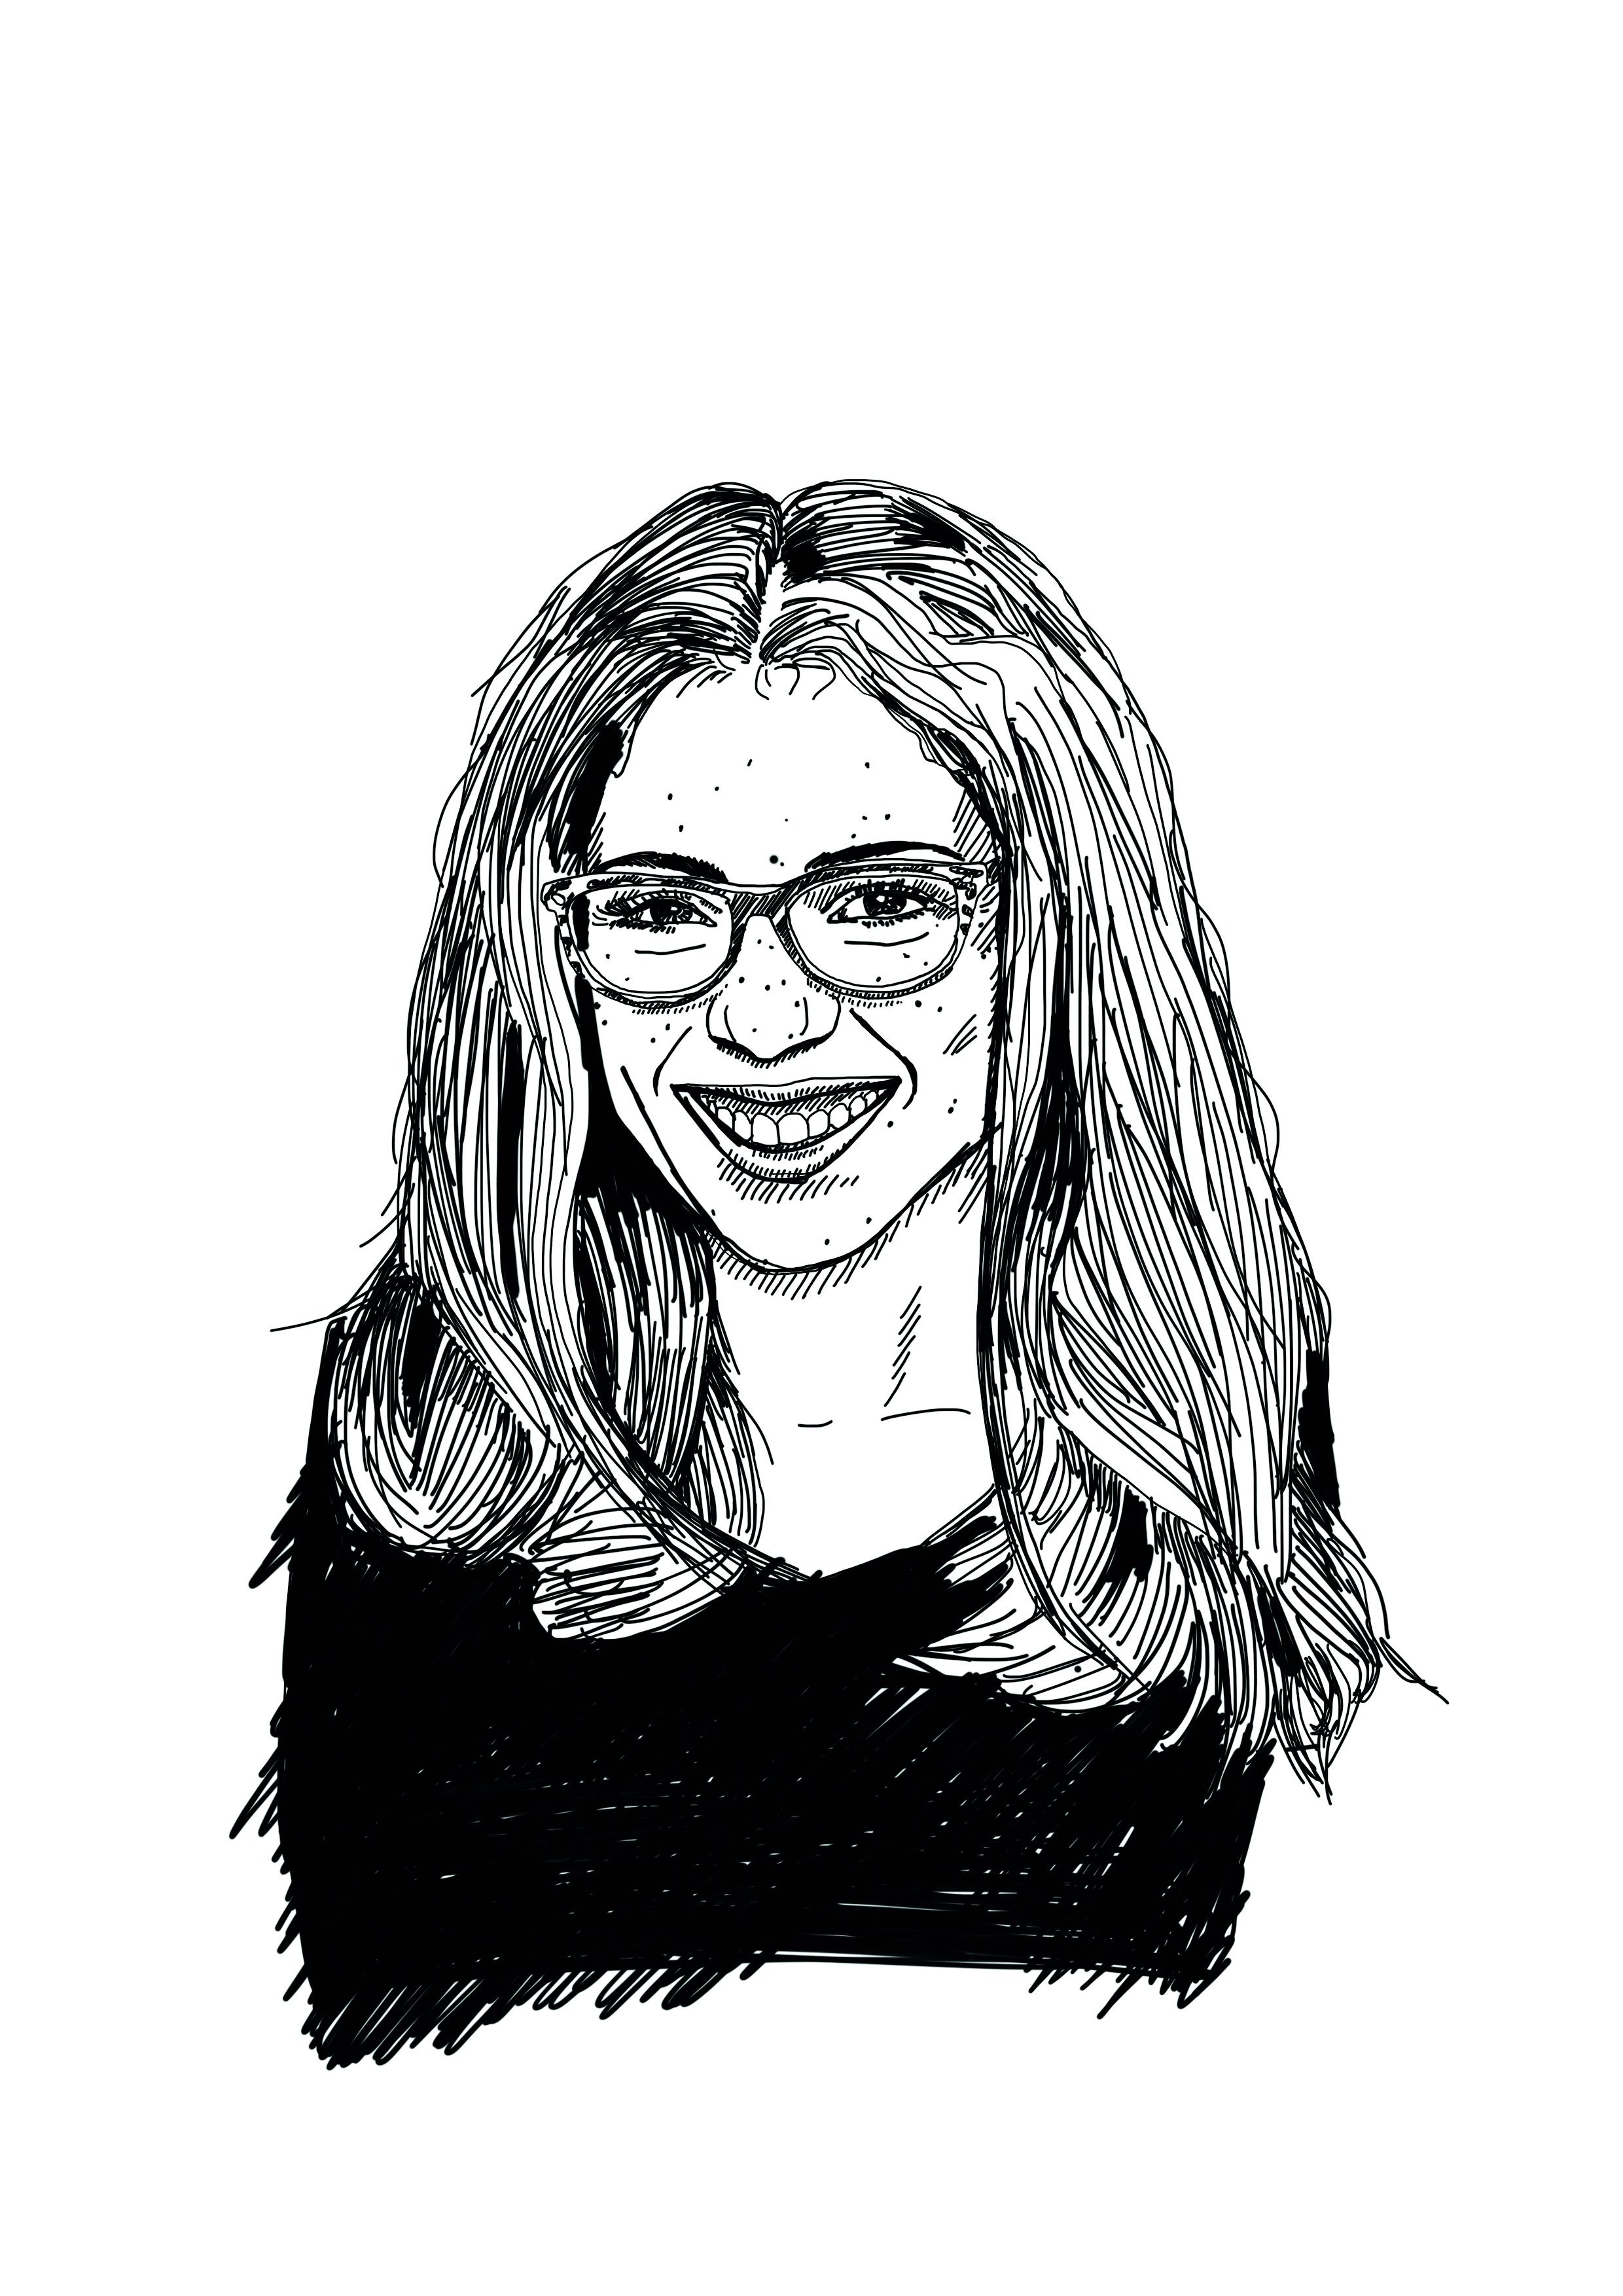 Stéfani Beatriz Moreno Mammel